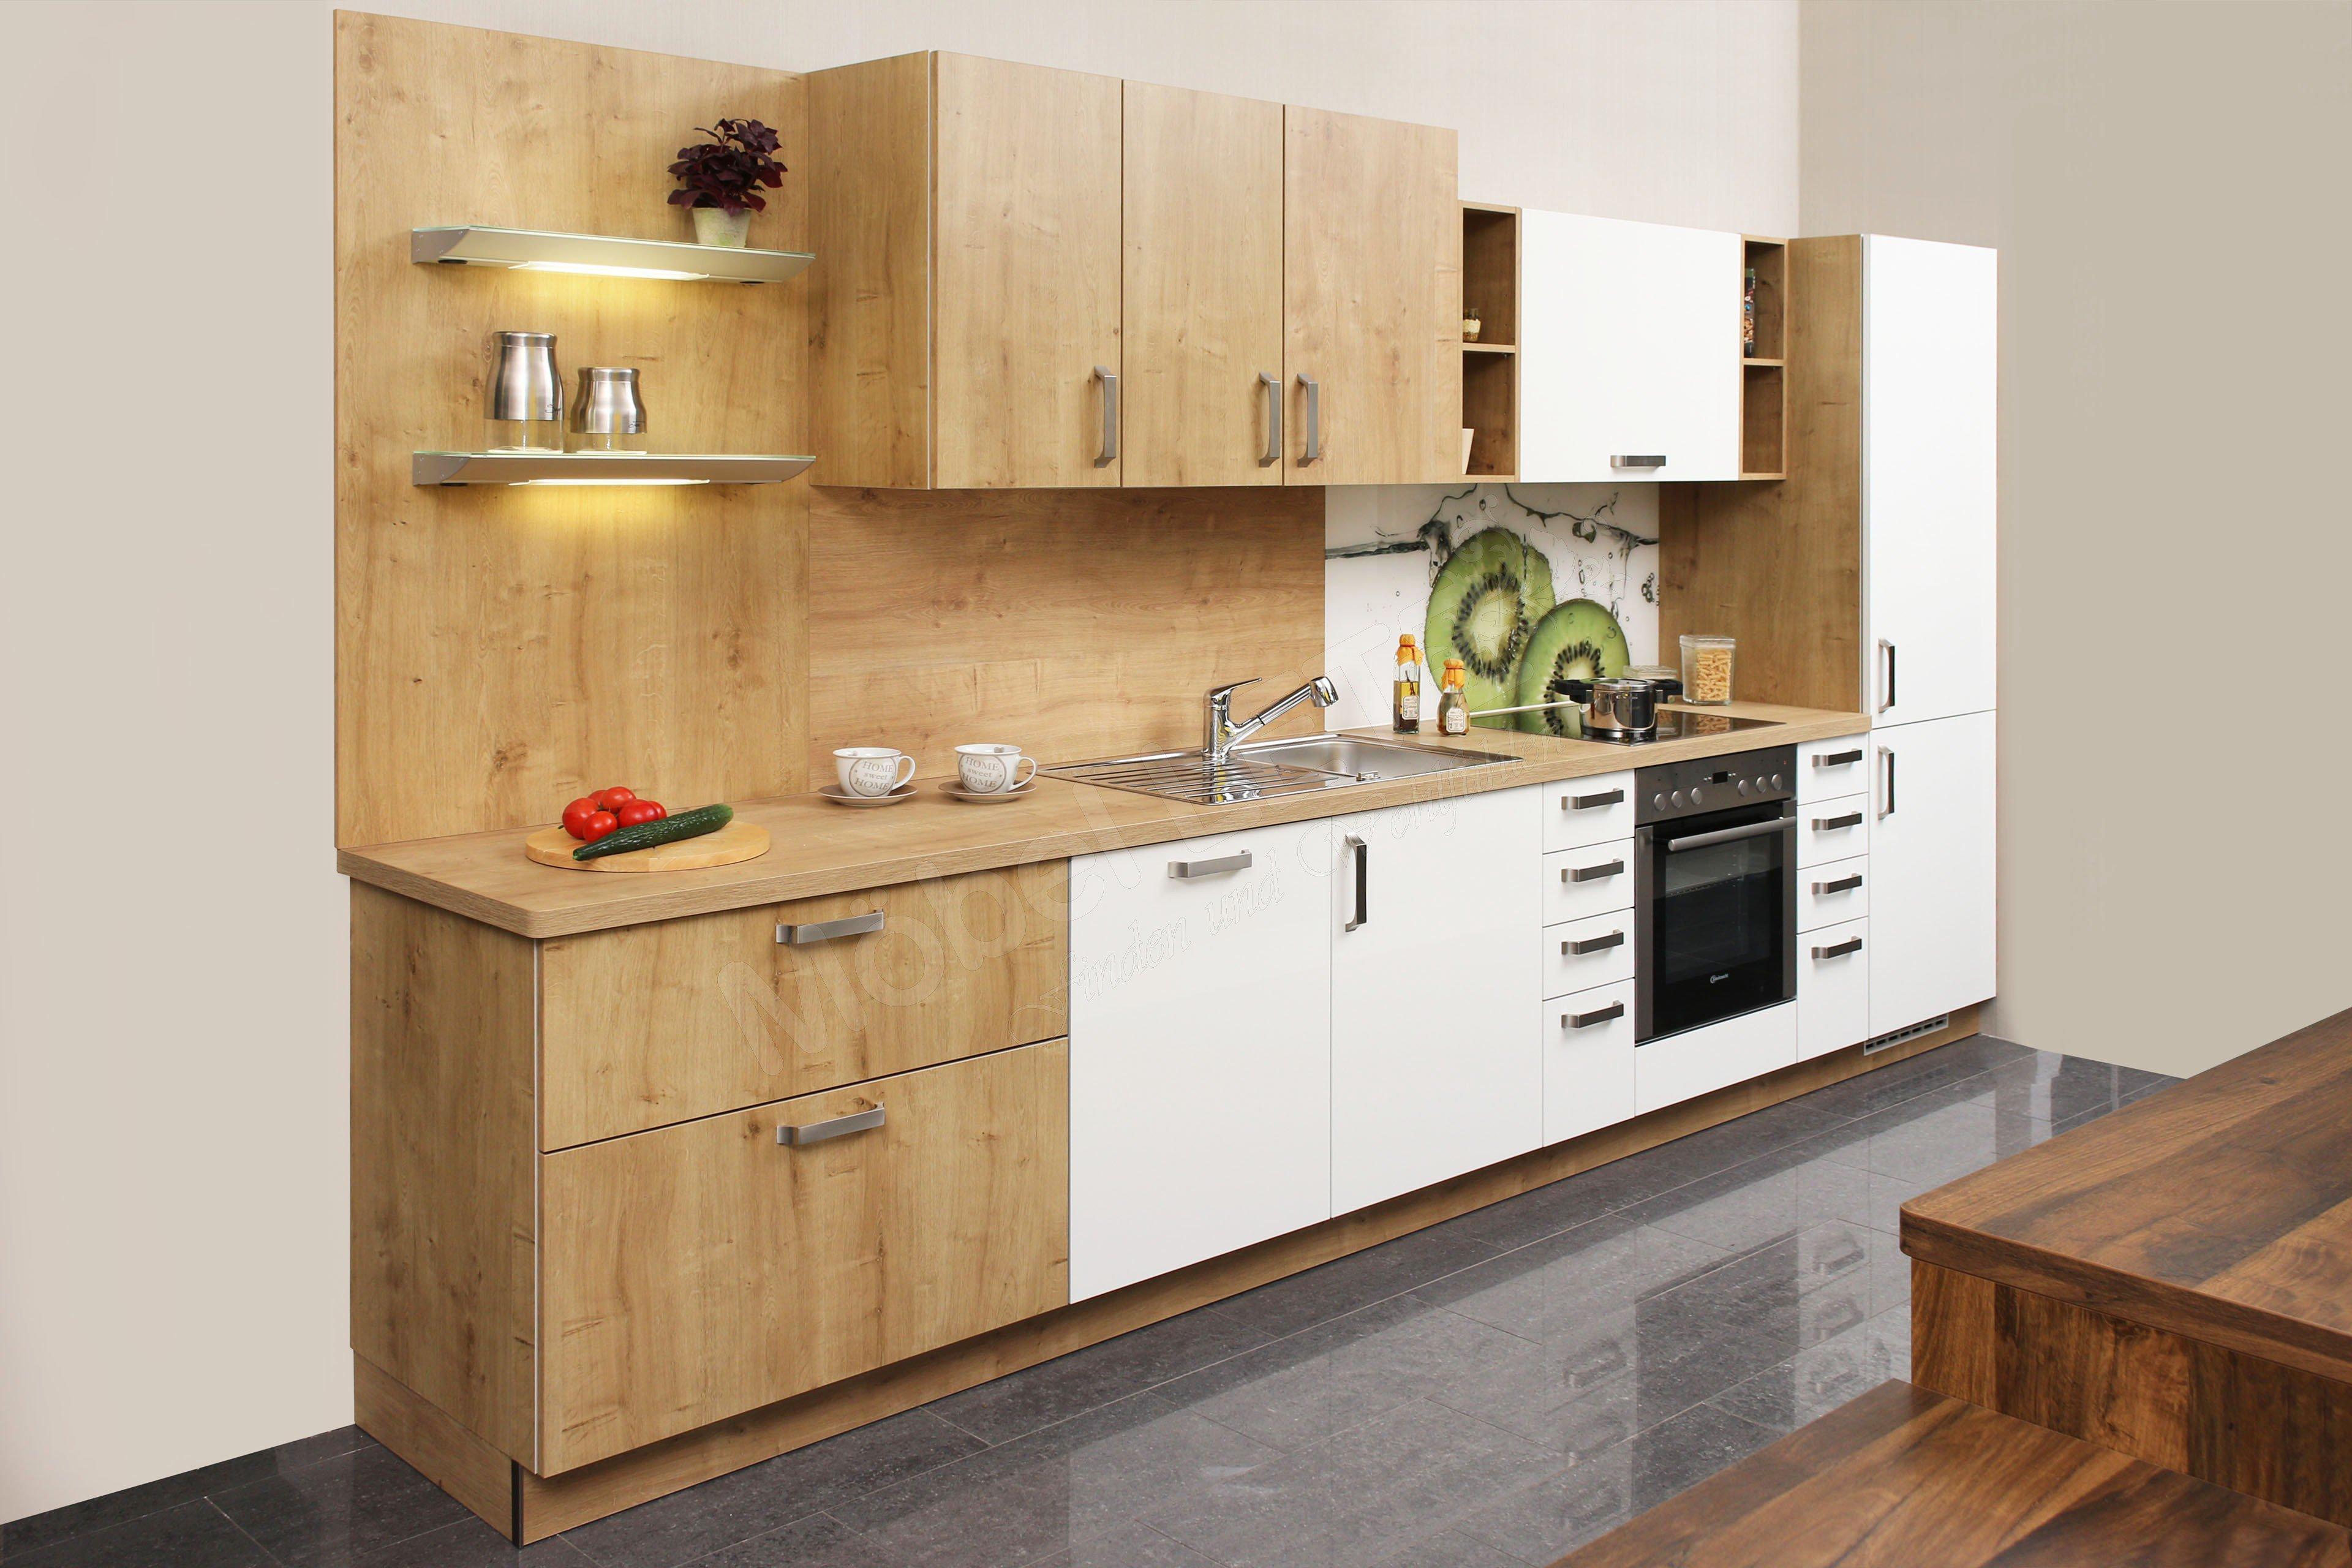 k che lack preis kleine k che bulthaup. Black Bedroom Furniture Sets. Home Design Ideas